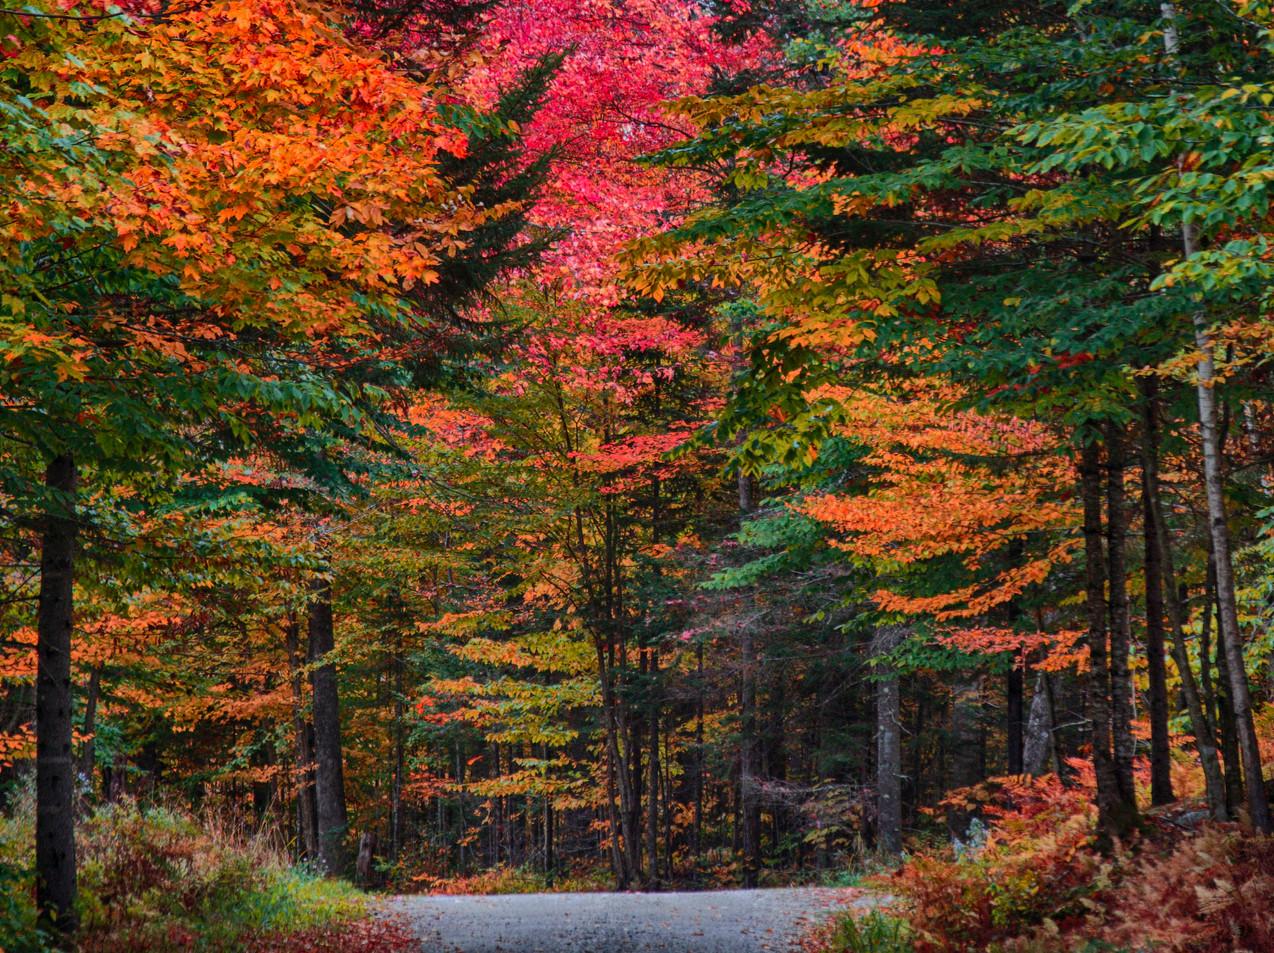 A Dirt Road In Autumn